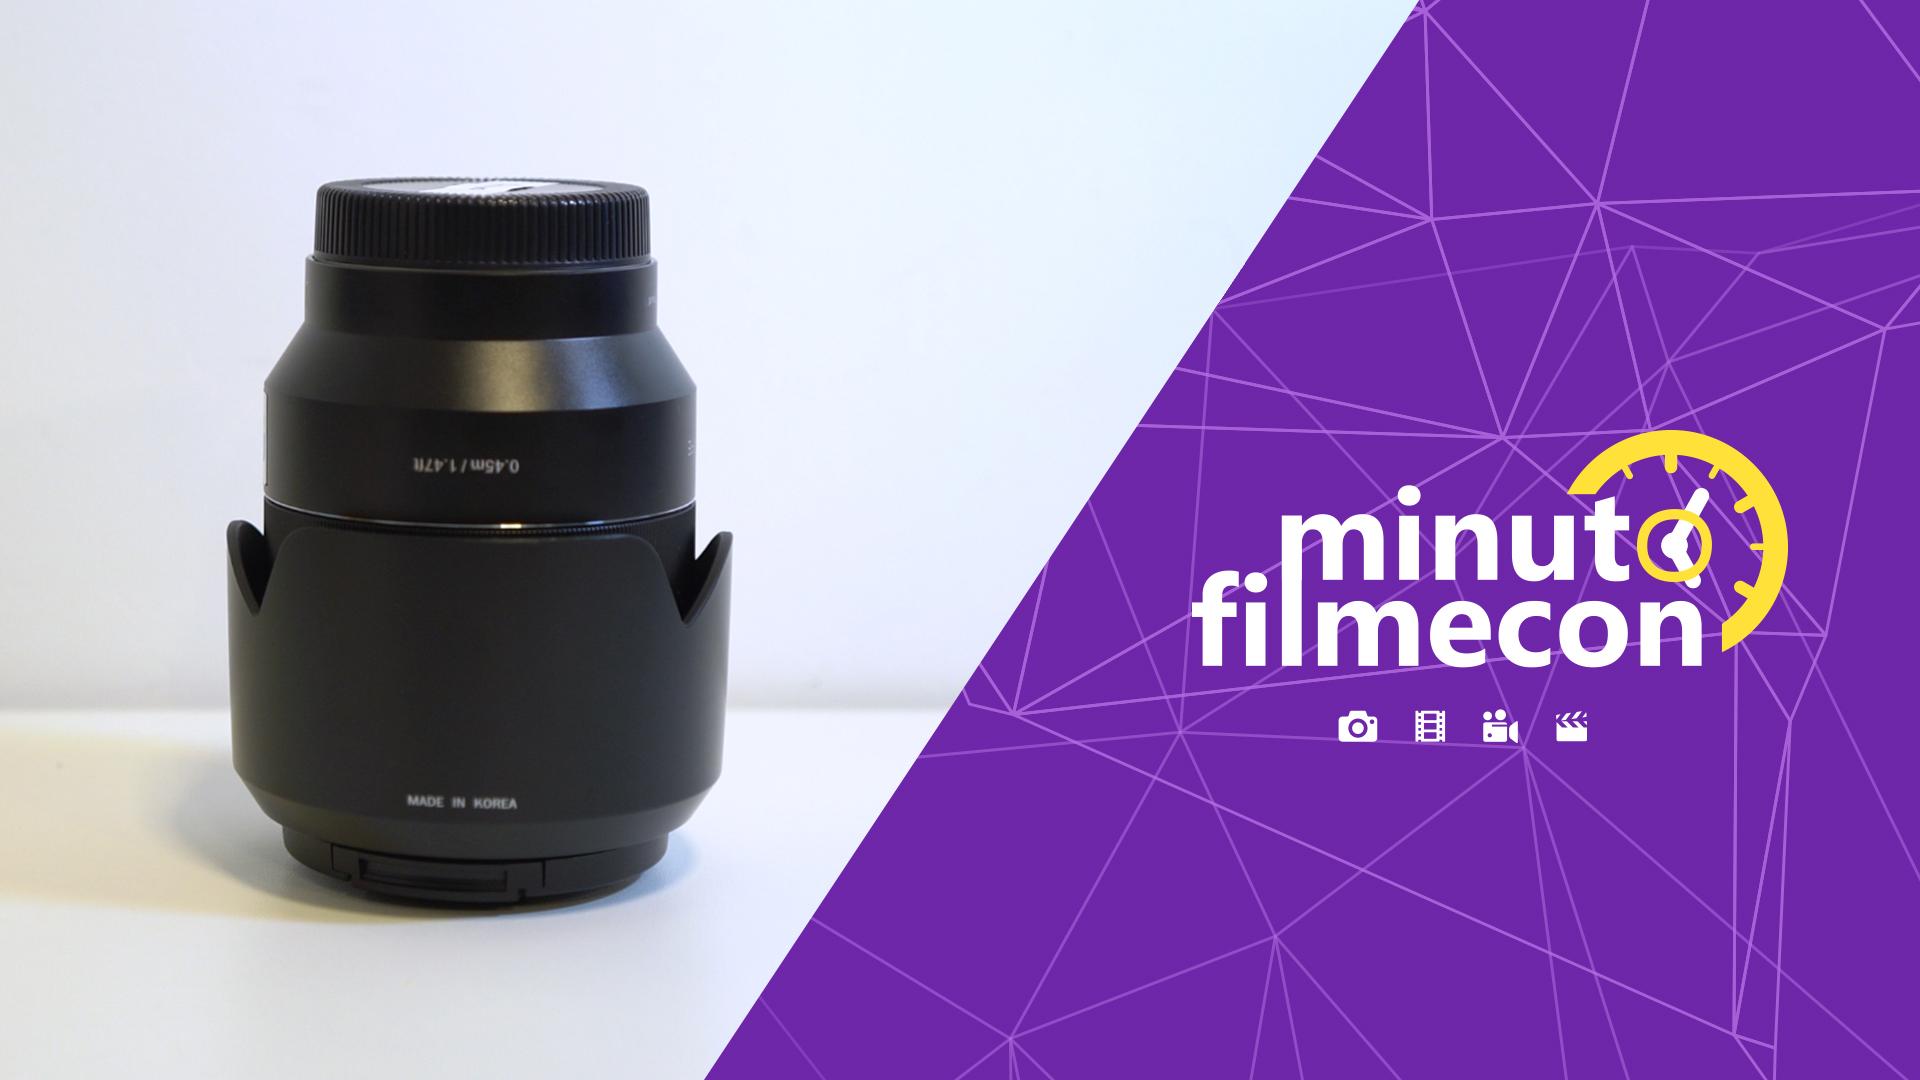 #24 - Rokinon 50mm f/1.4